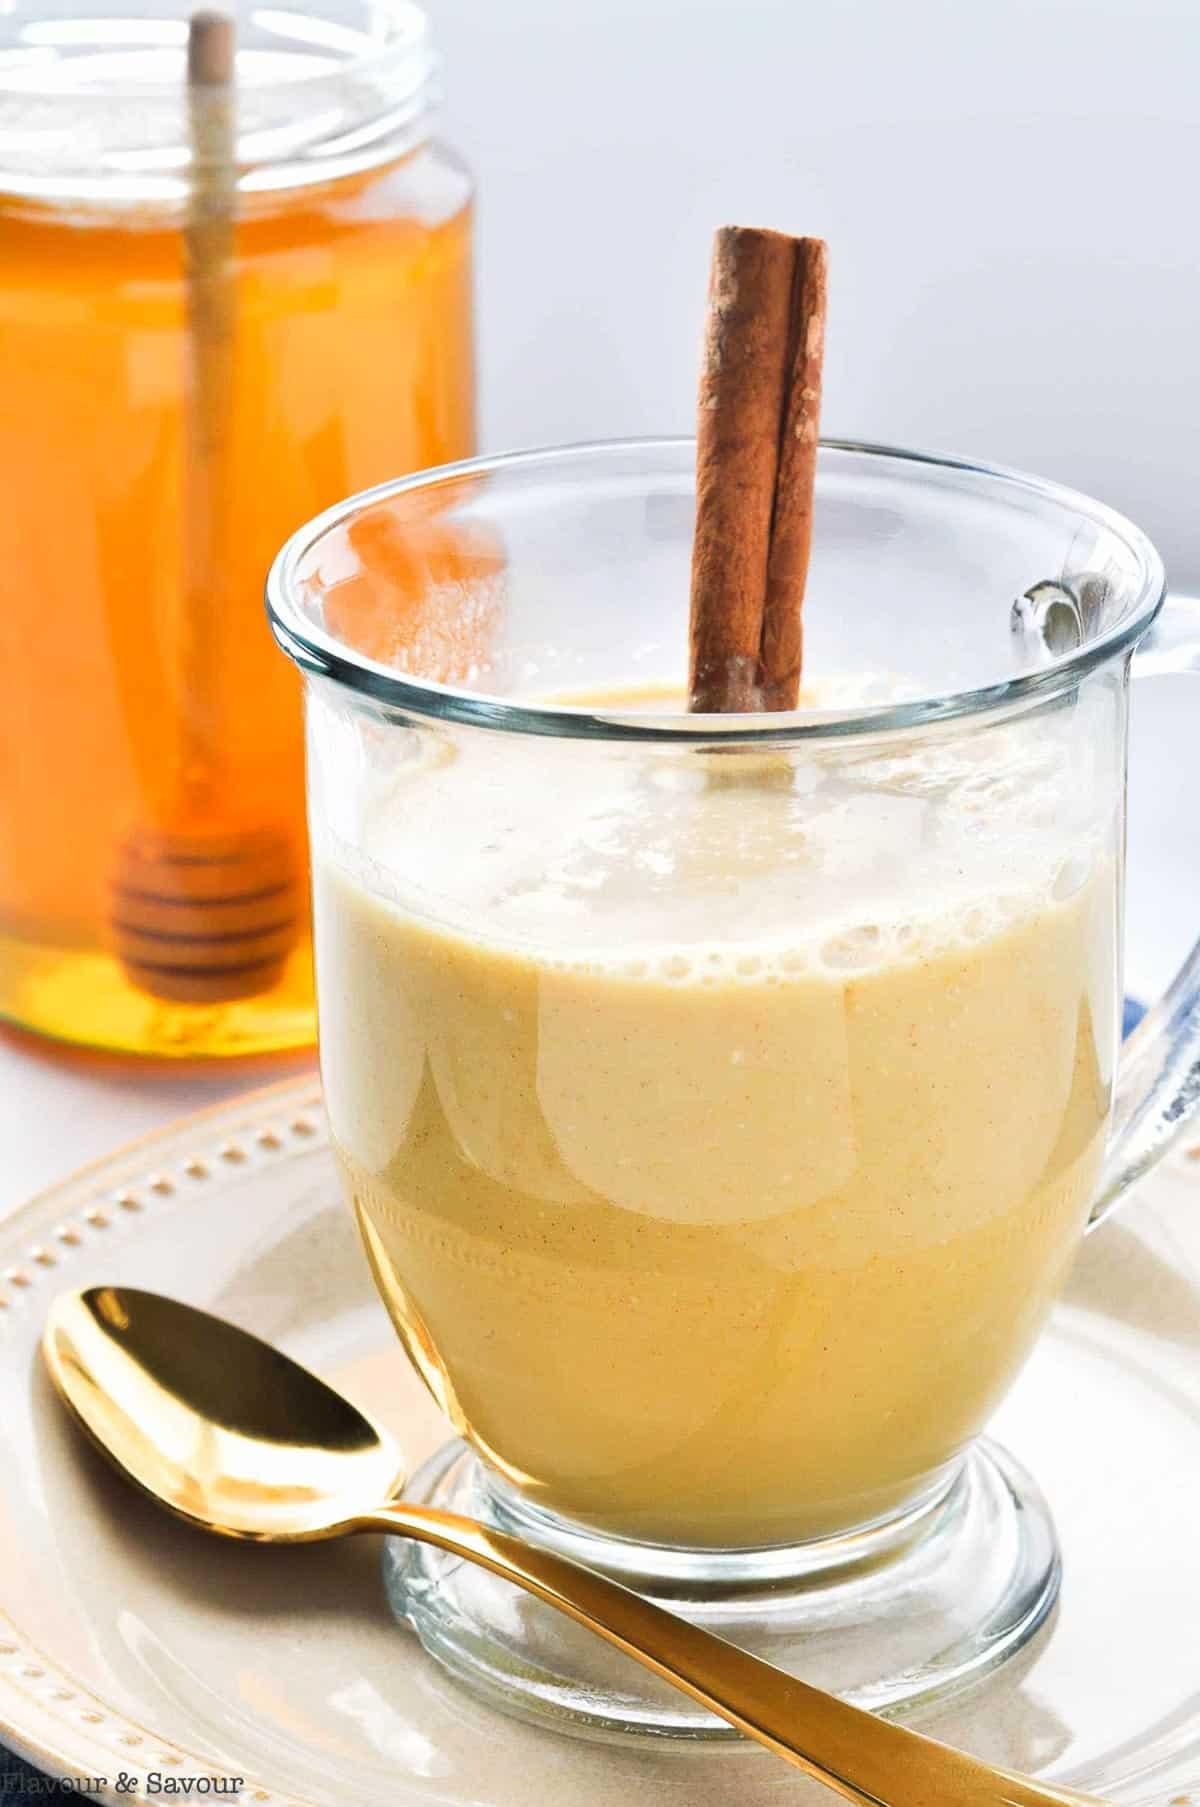 Warm Turmeric Cinnamon Milk in a glass mug with a cinnamon stick